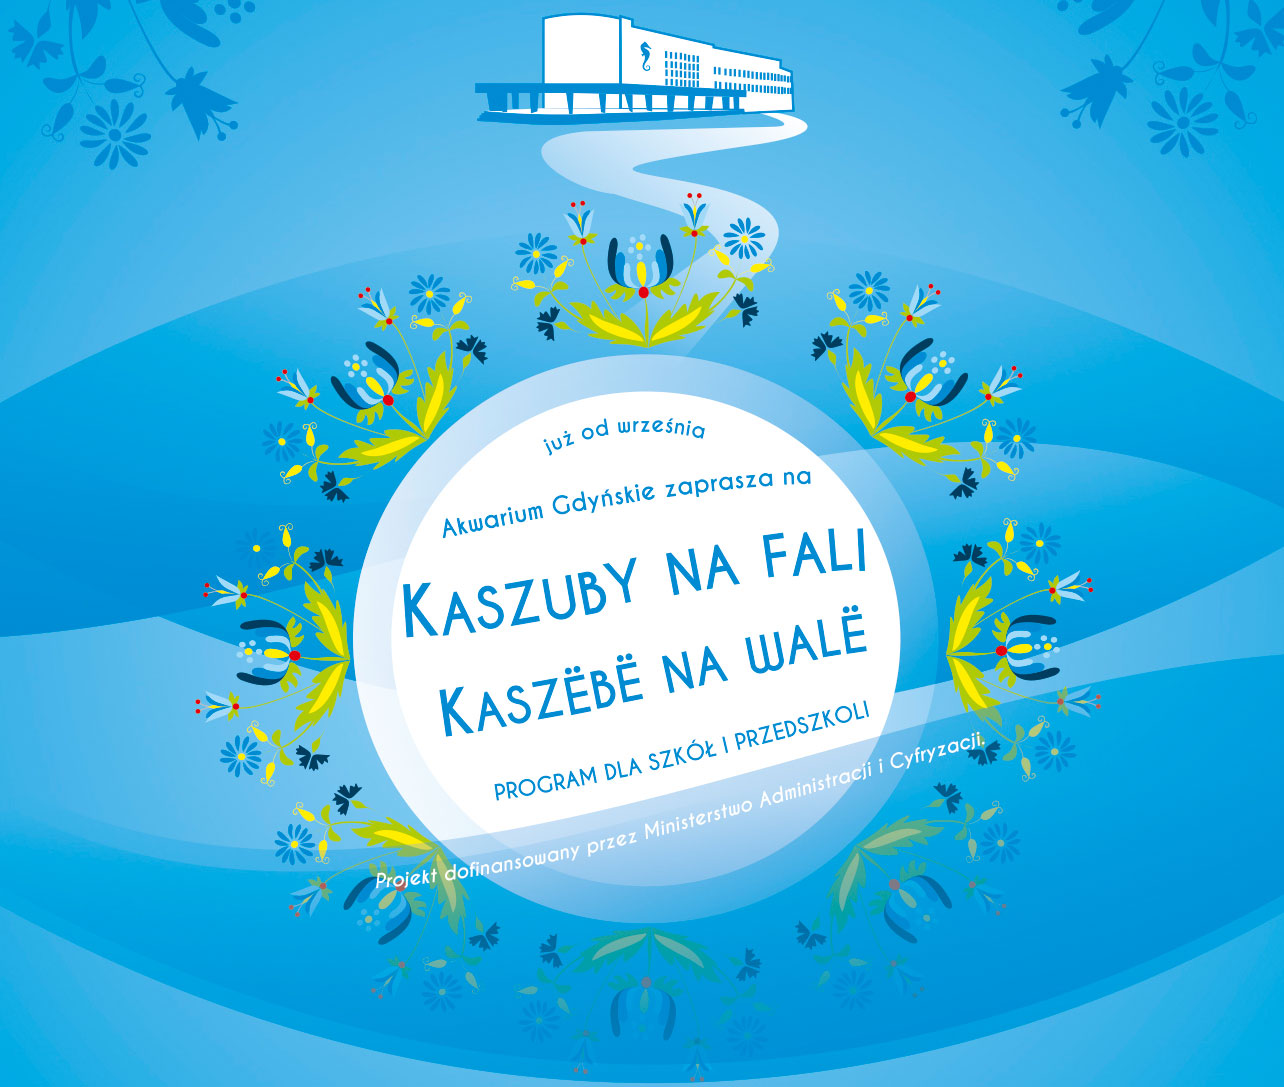 Kashubia on the wave 2017